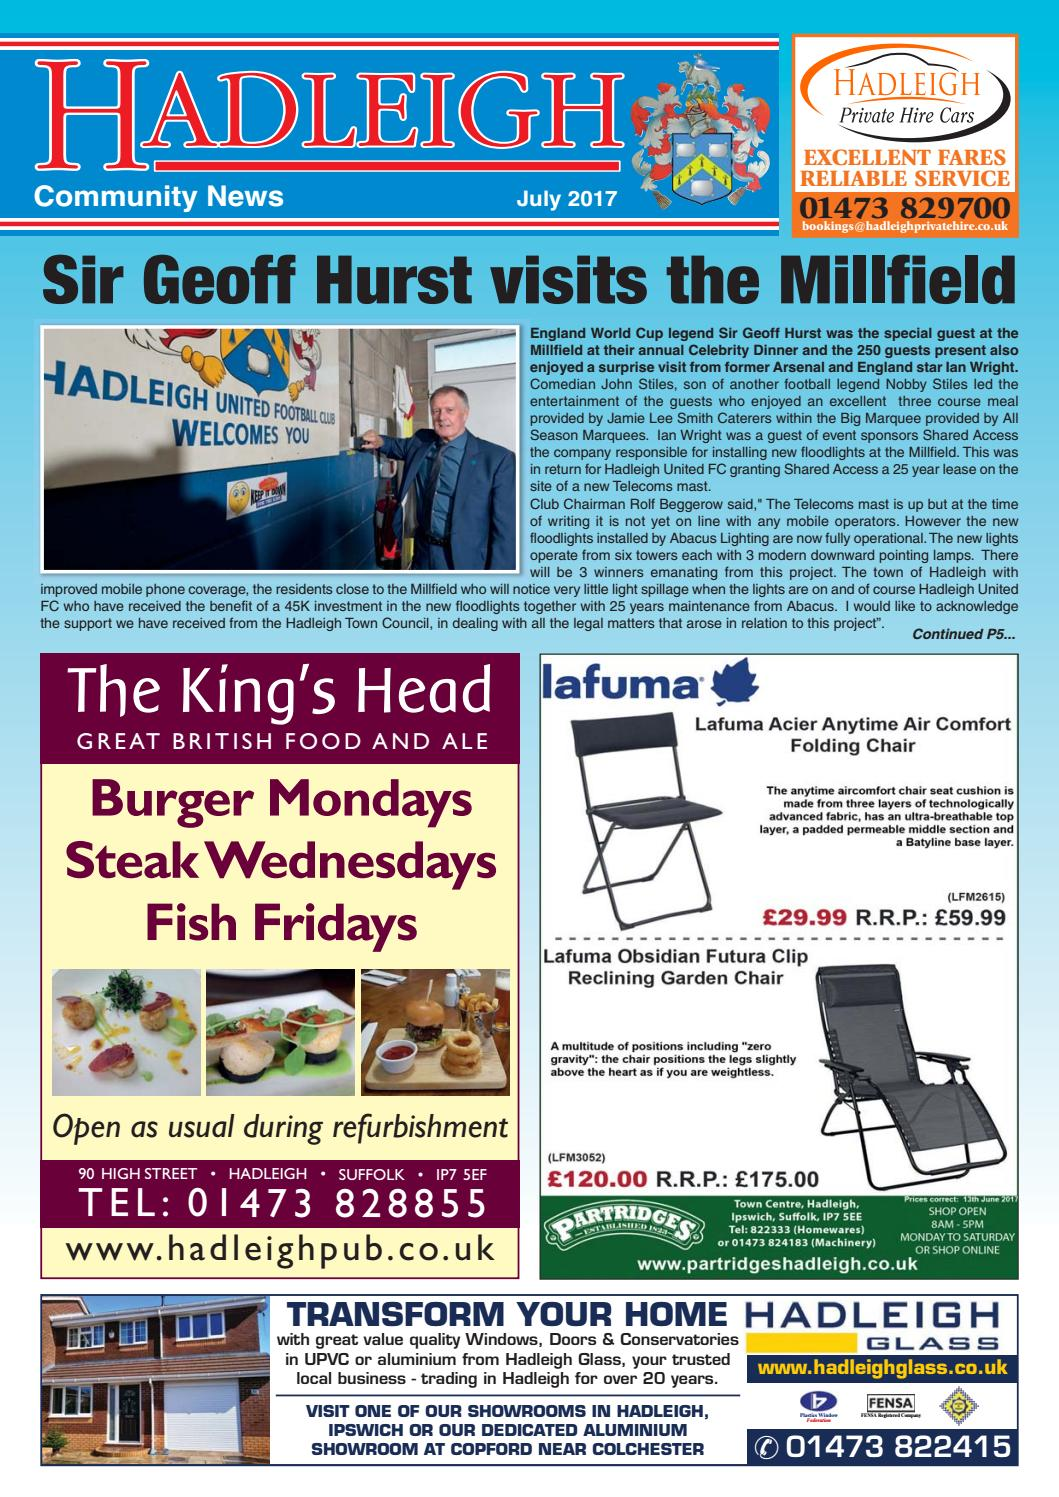 Hadleigh Community News July 2017 By Keith Avis Printers